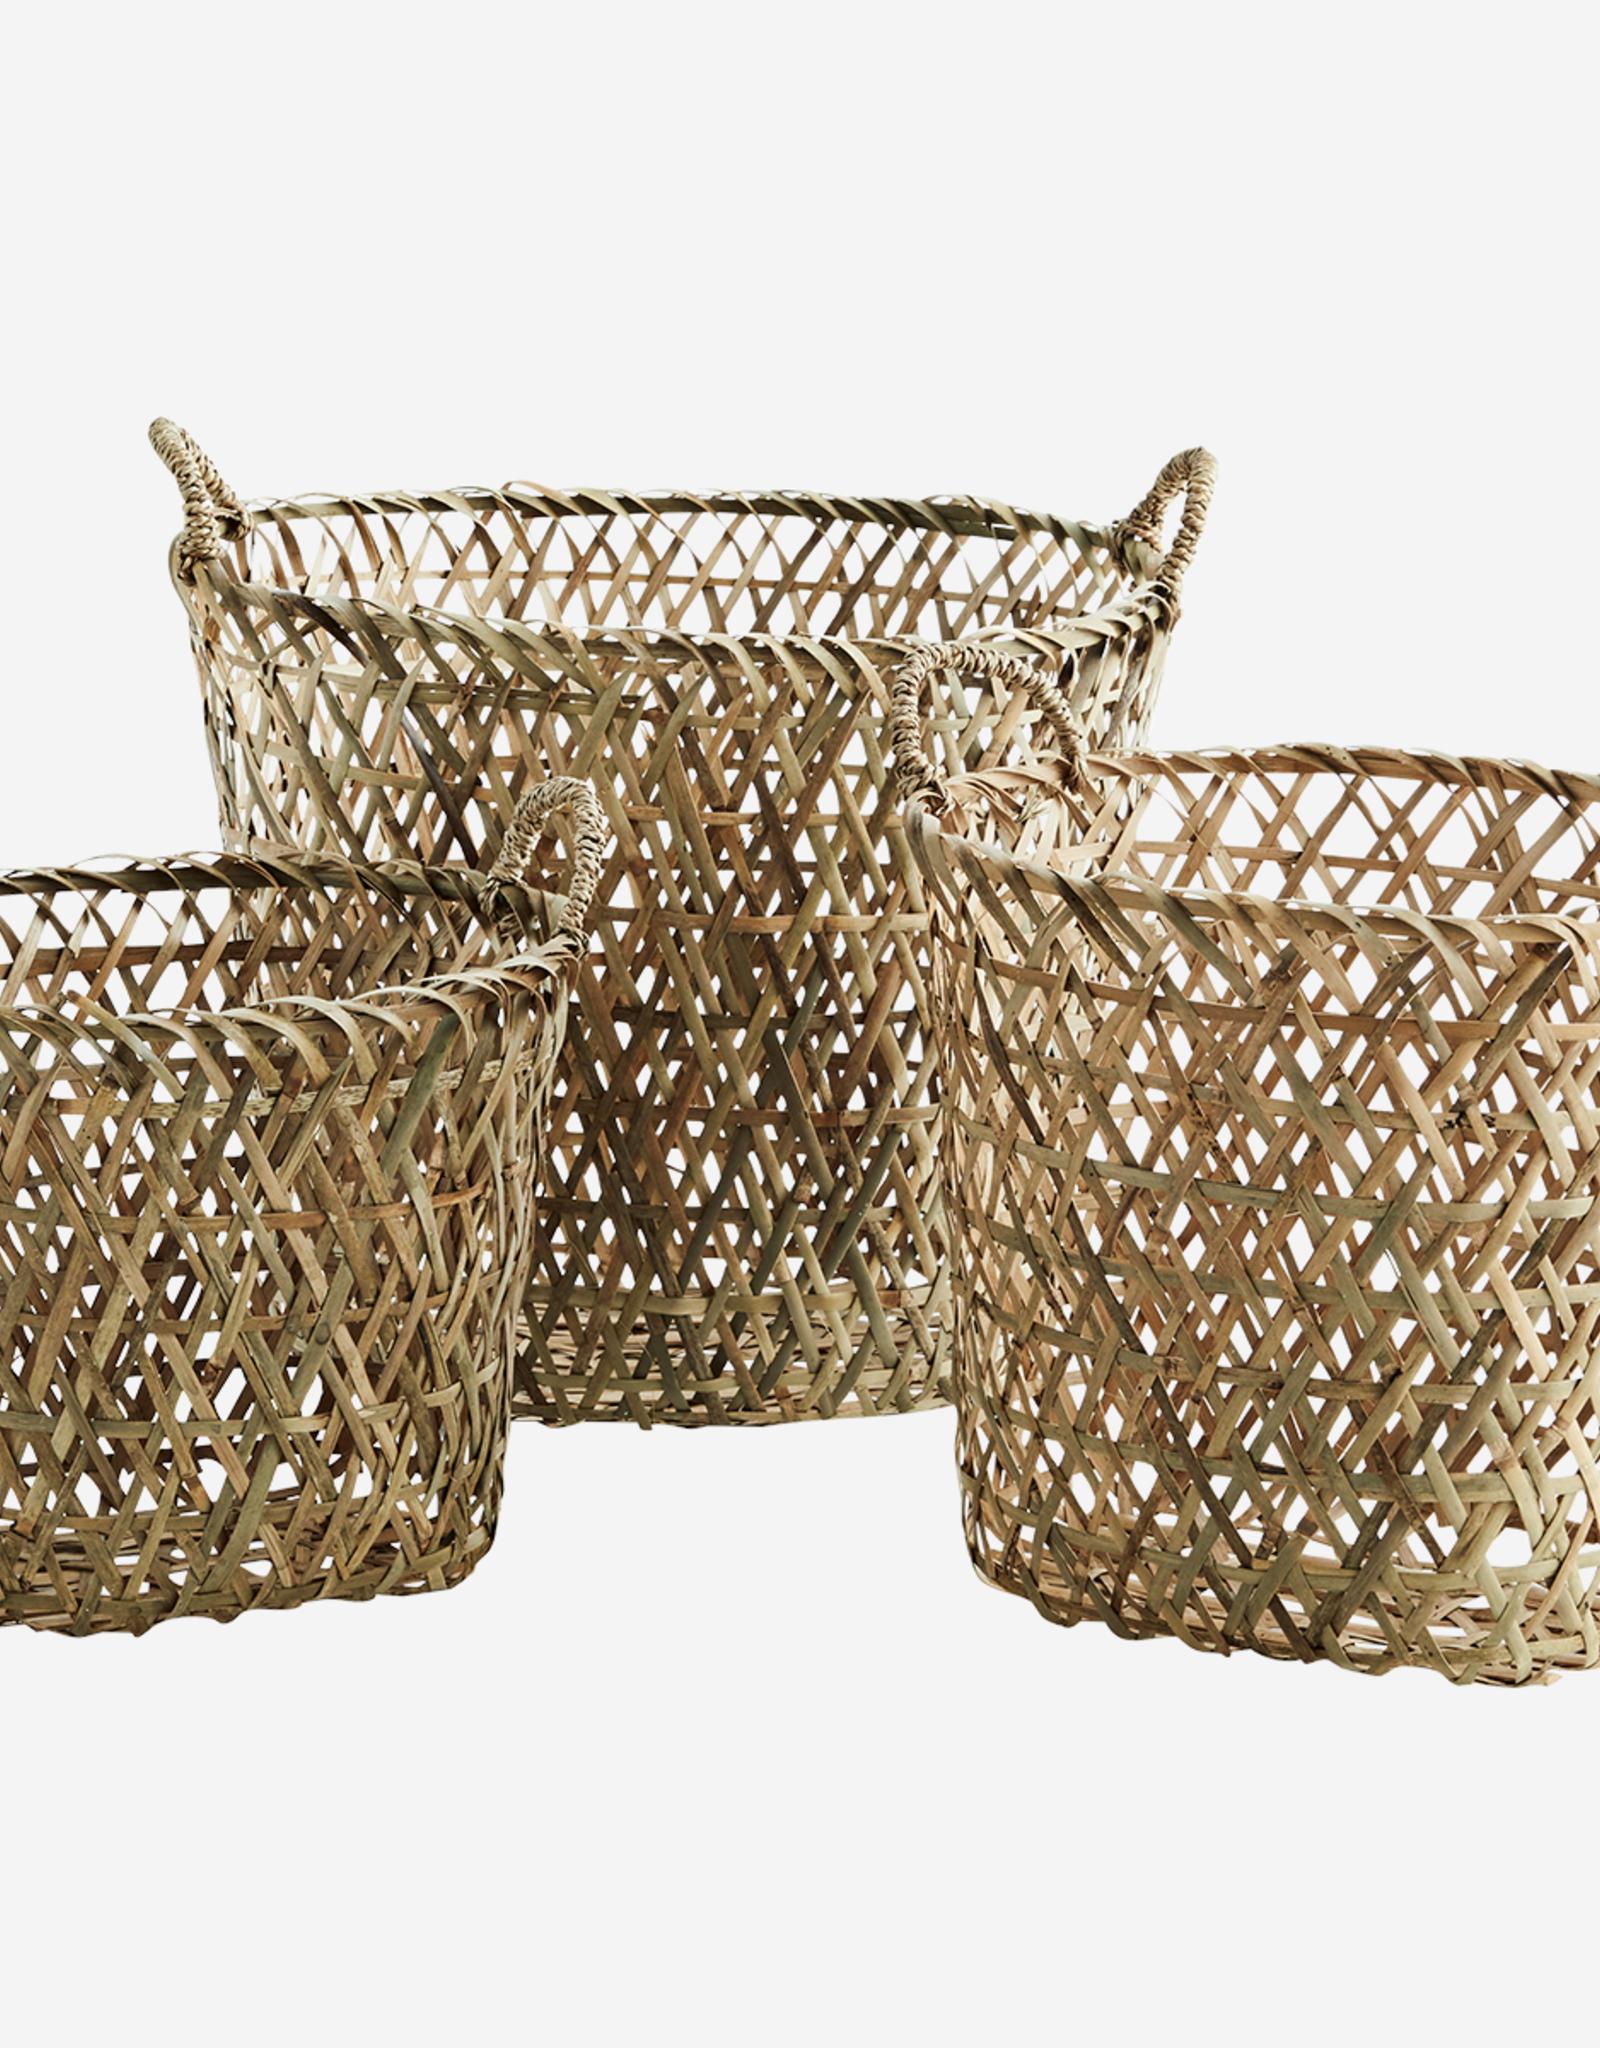 Madam Stoltz Madam Stoltz - Oval bamboo baskets w/handle natural - L